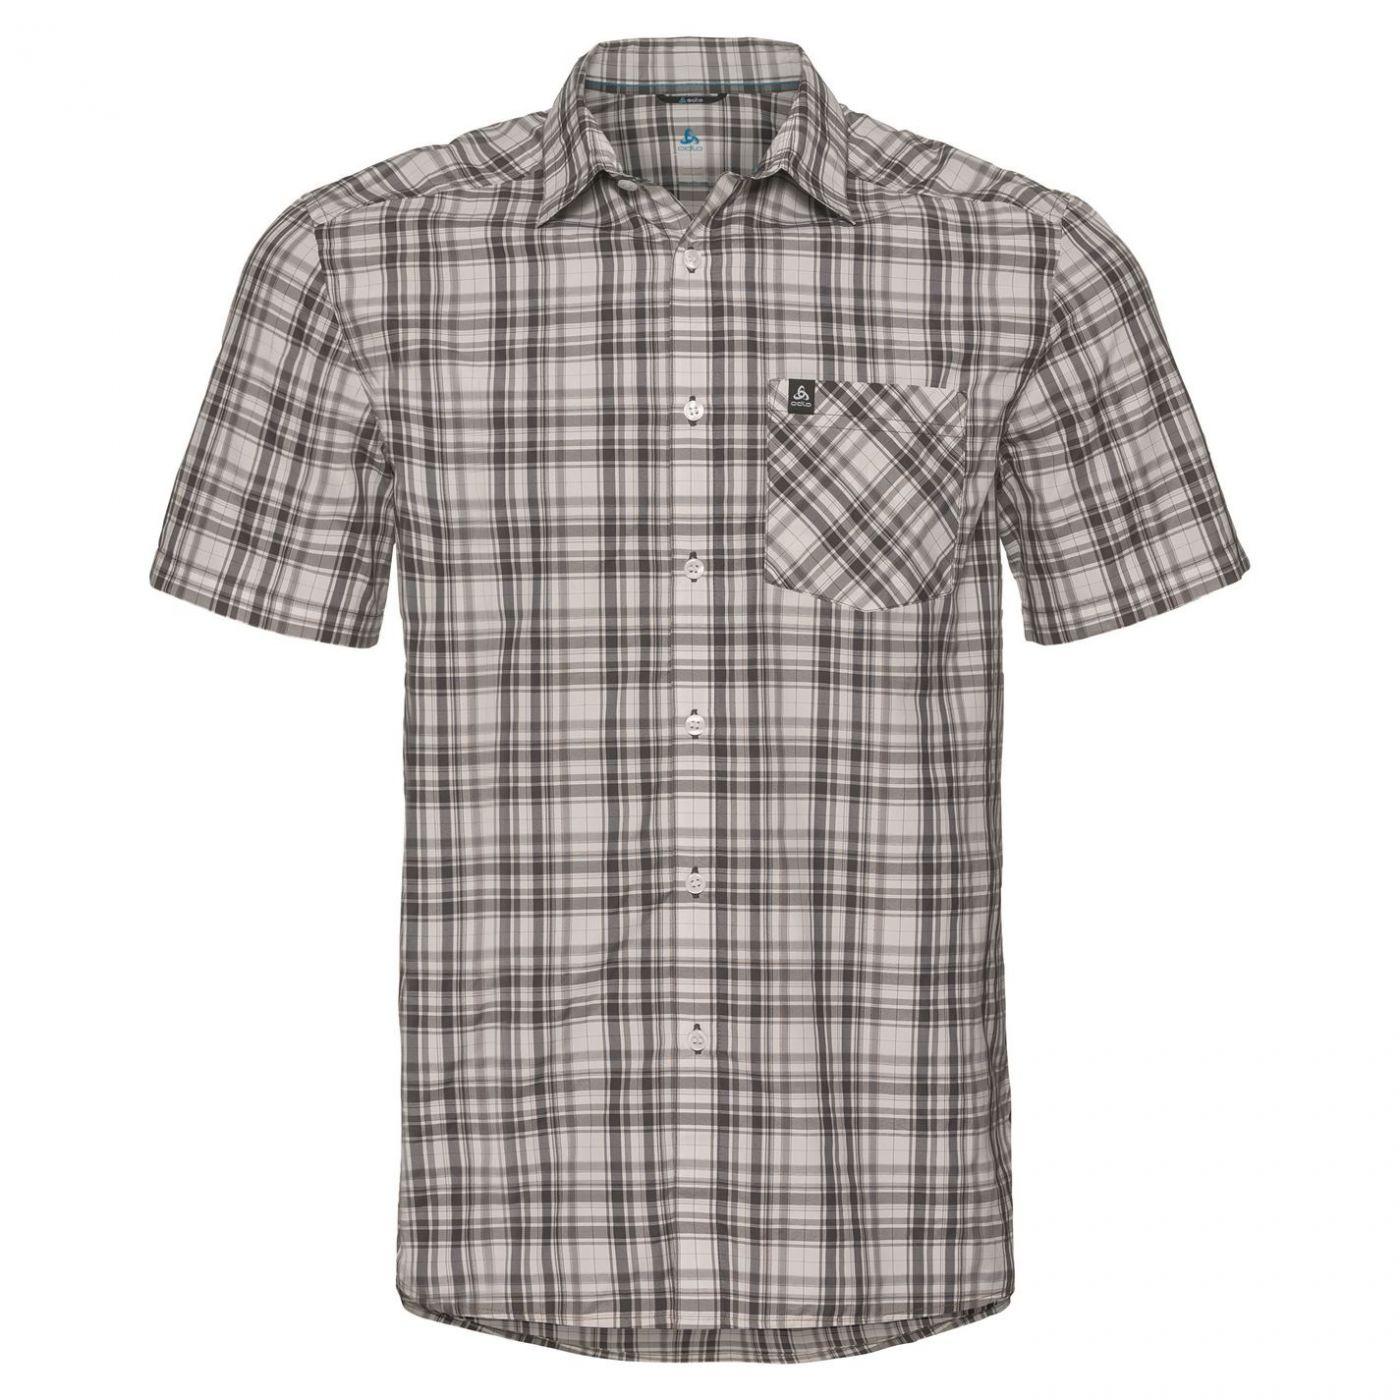 Odlo Mythen Short Sleeve Shirt Mens